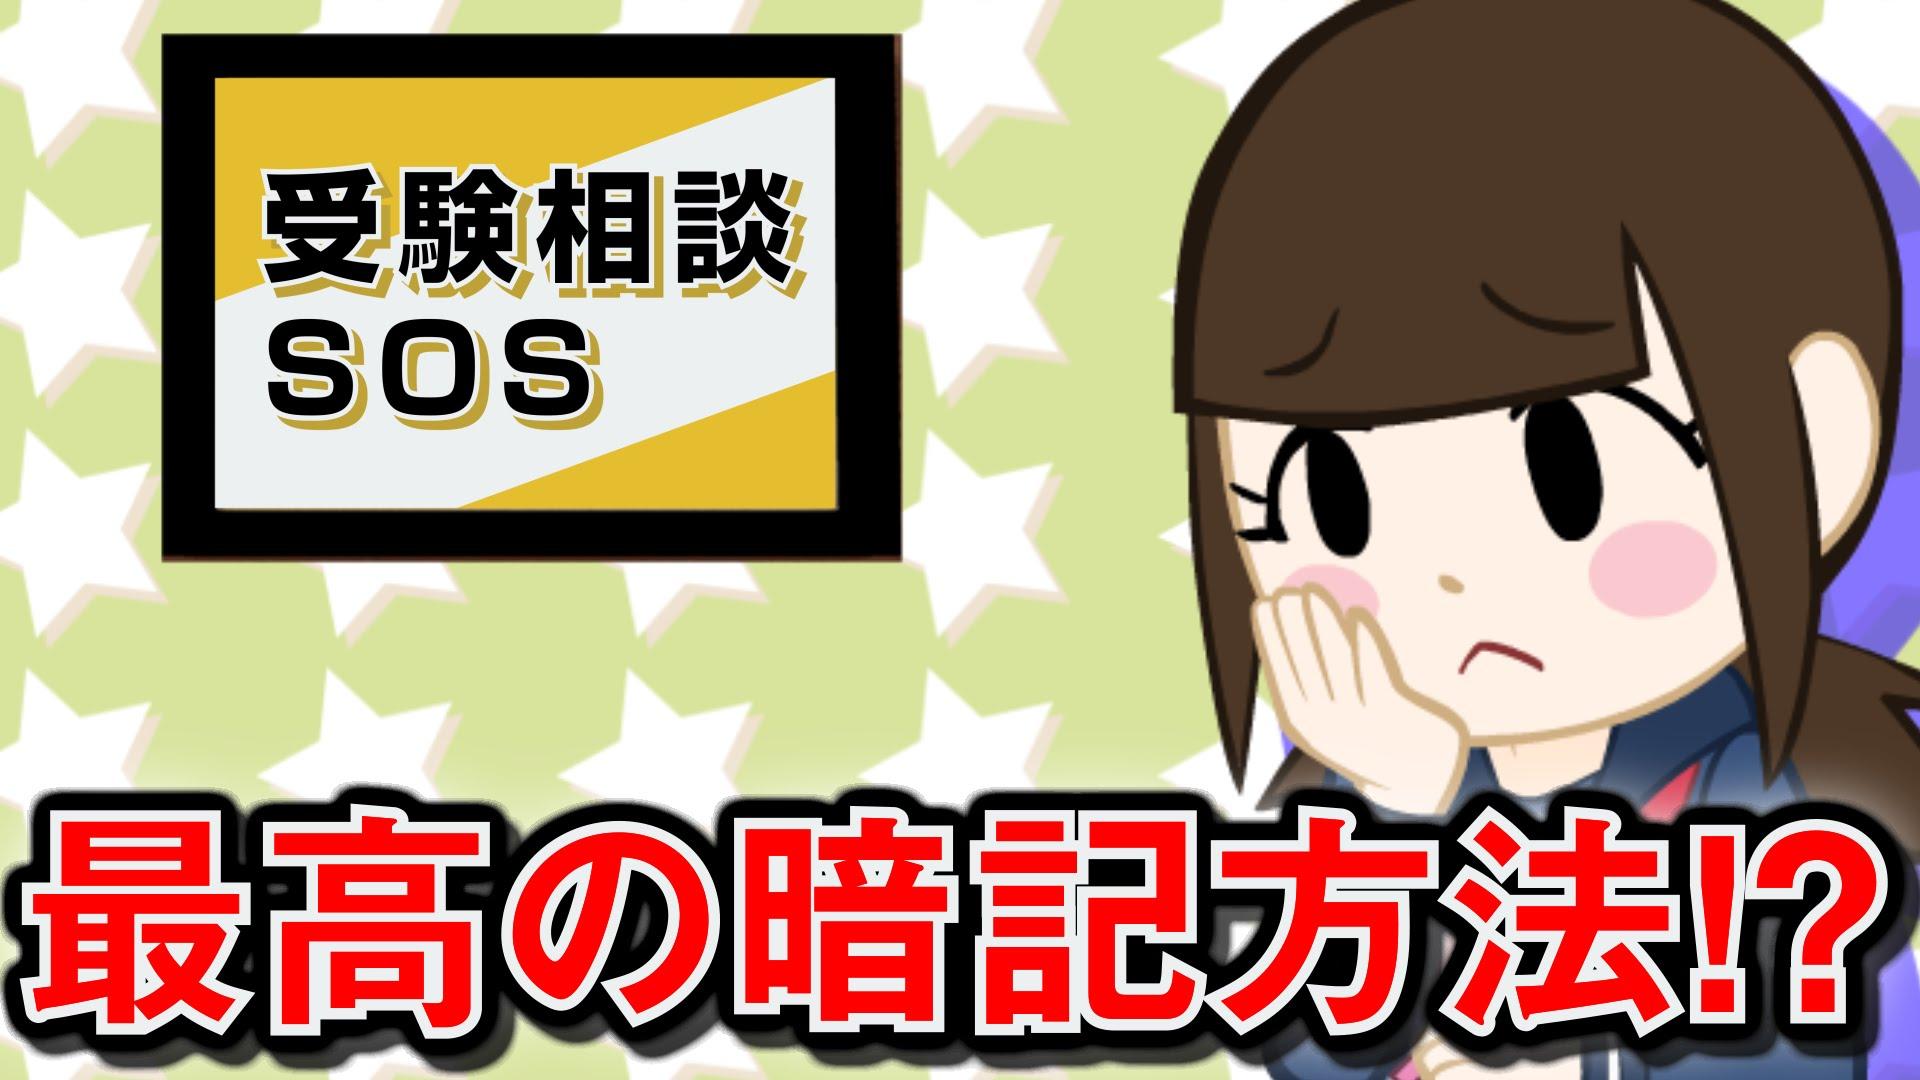 【vol.34】最強の暗記方法!?|受験相談SOS